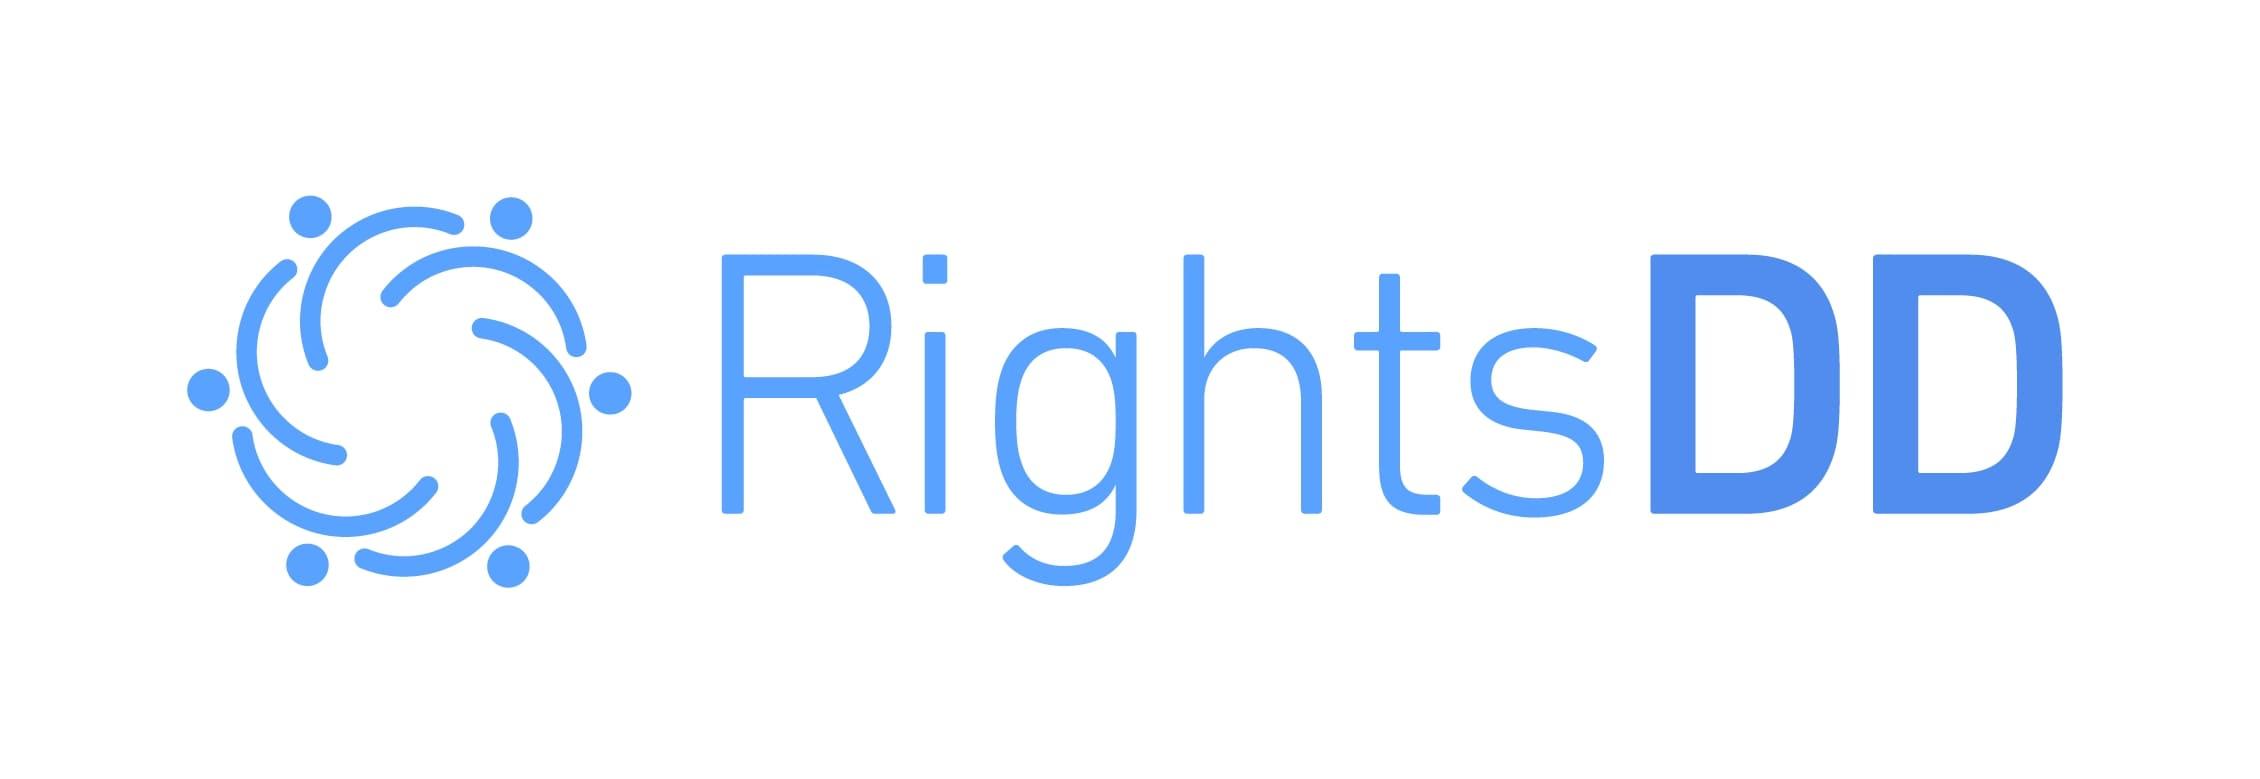 RightsDD